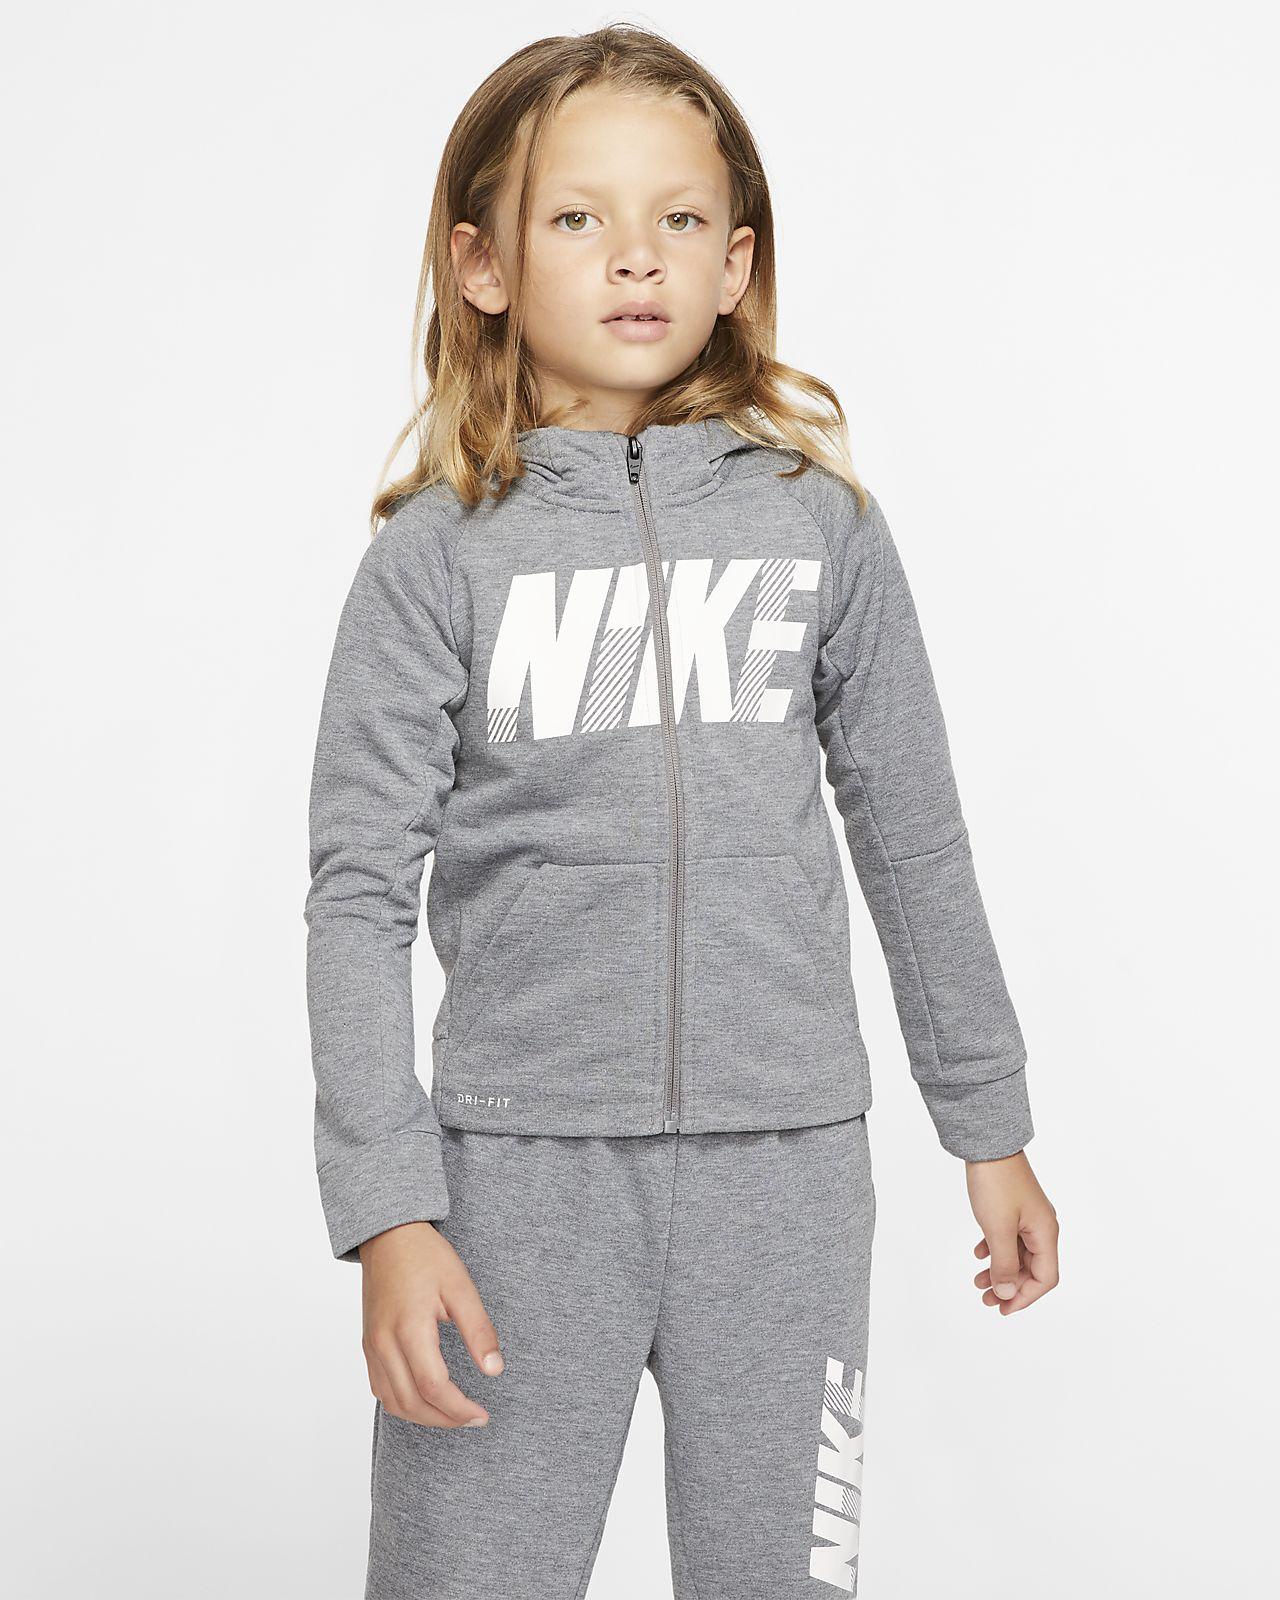 Nike Dri-FIT Little Kids' Full-Zip Hoodie